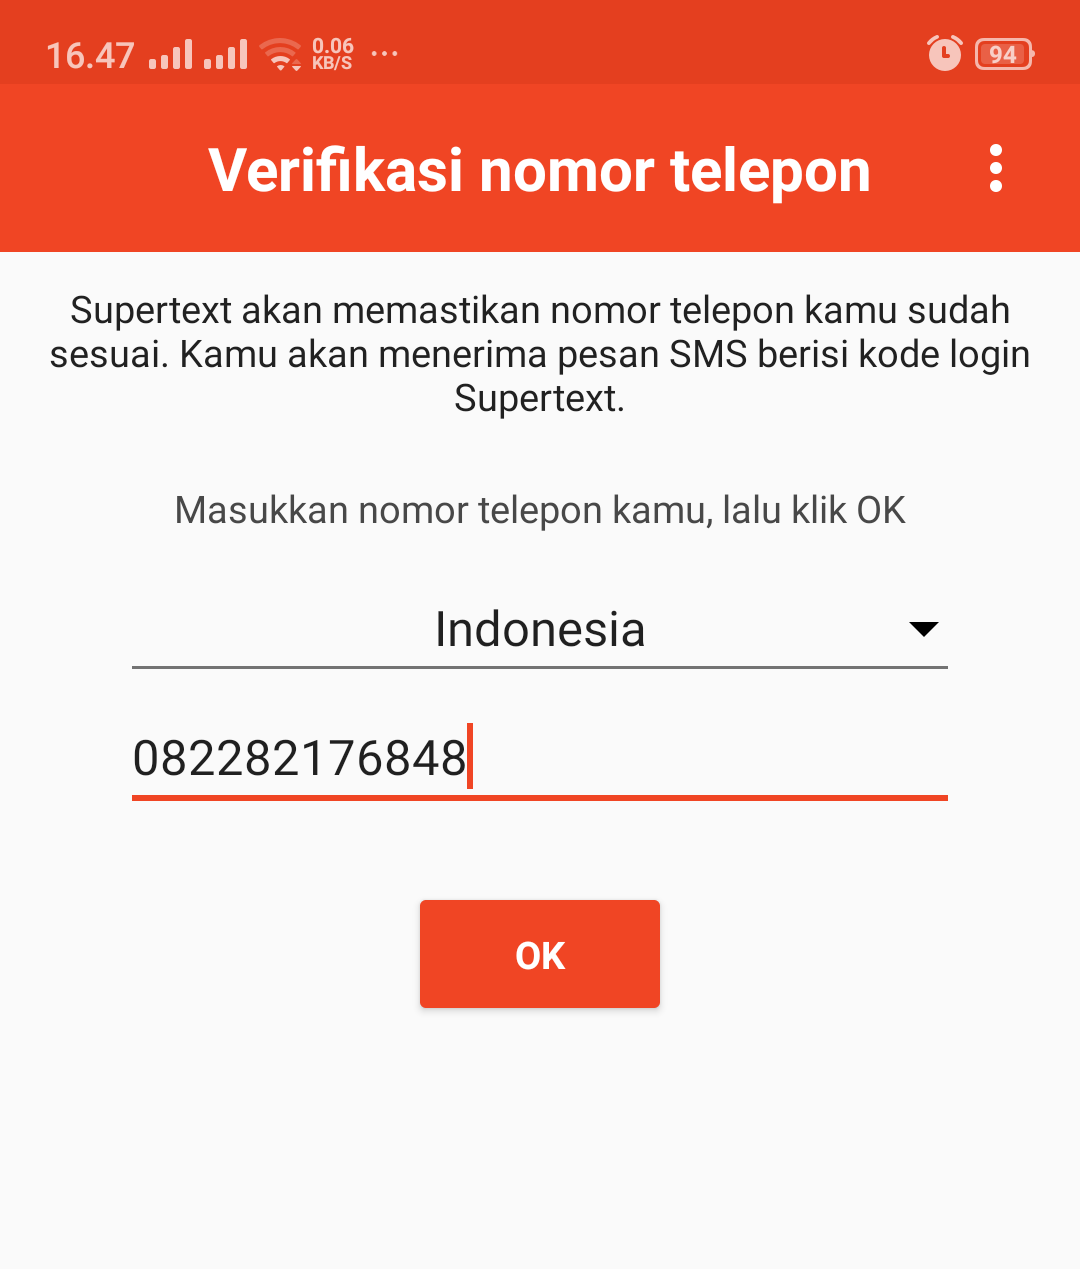 verifikasi nomor telepon